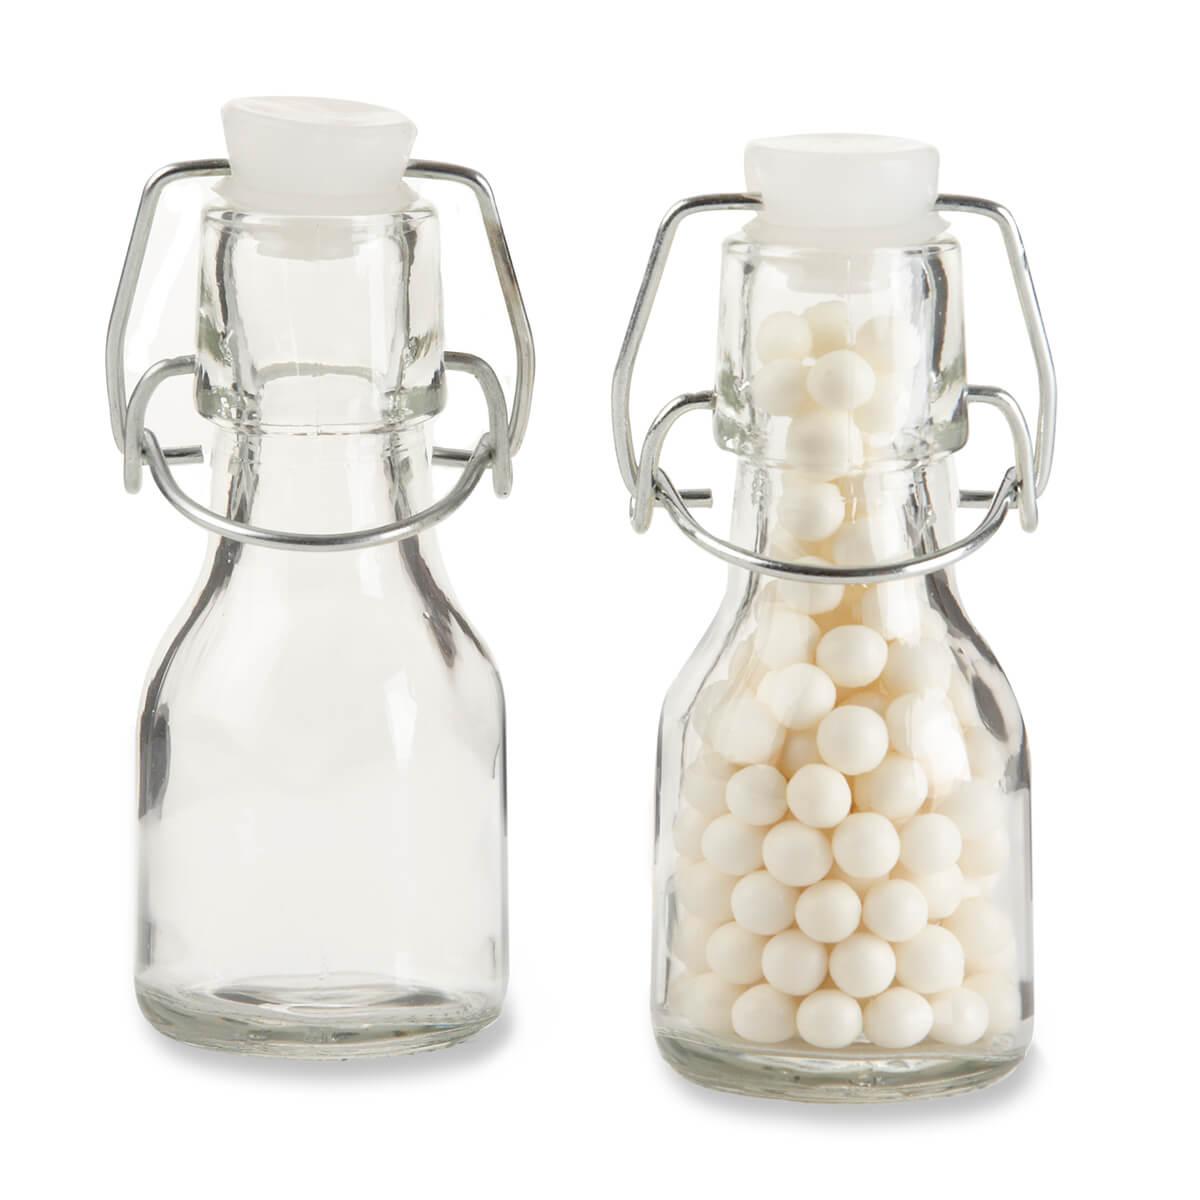 12 4 Quot Glass Swing Top Bottles